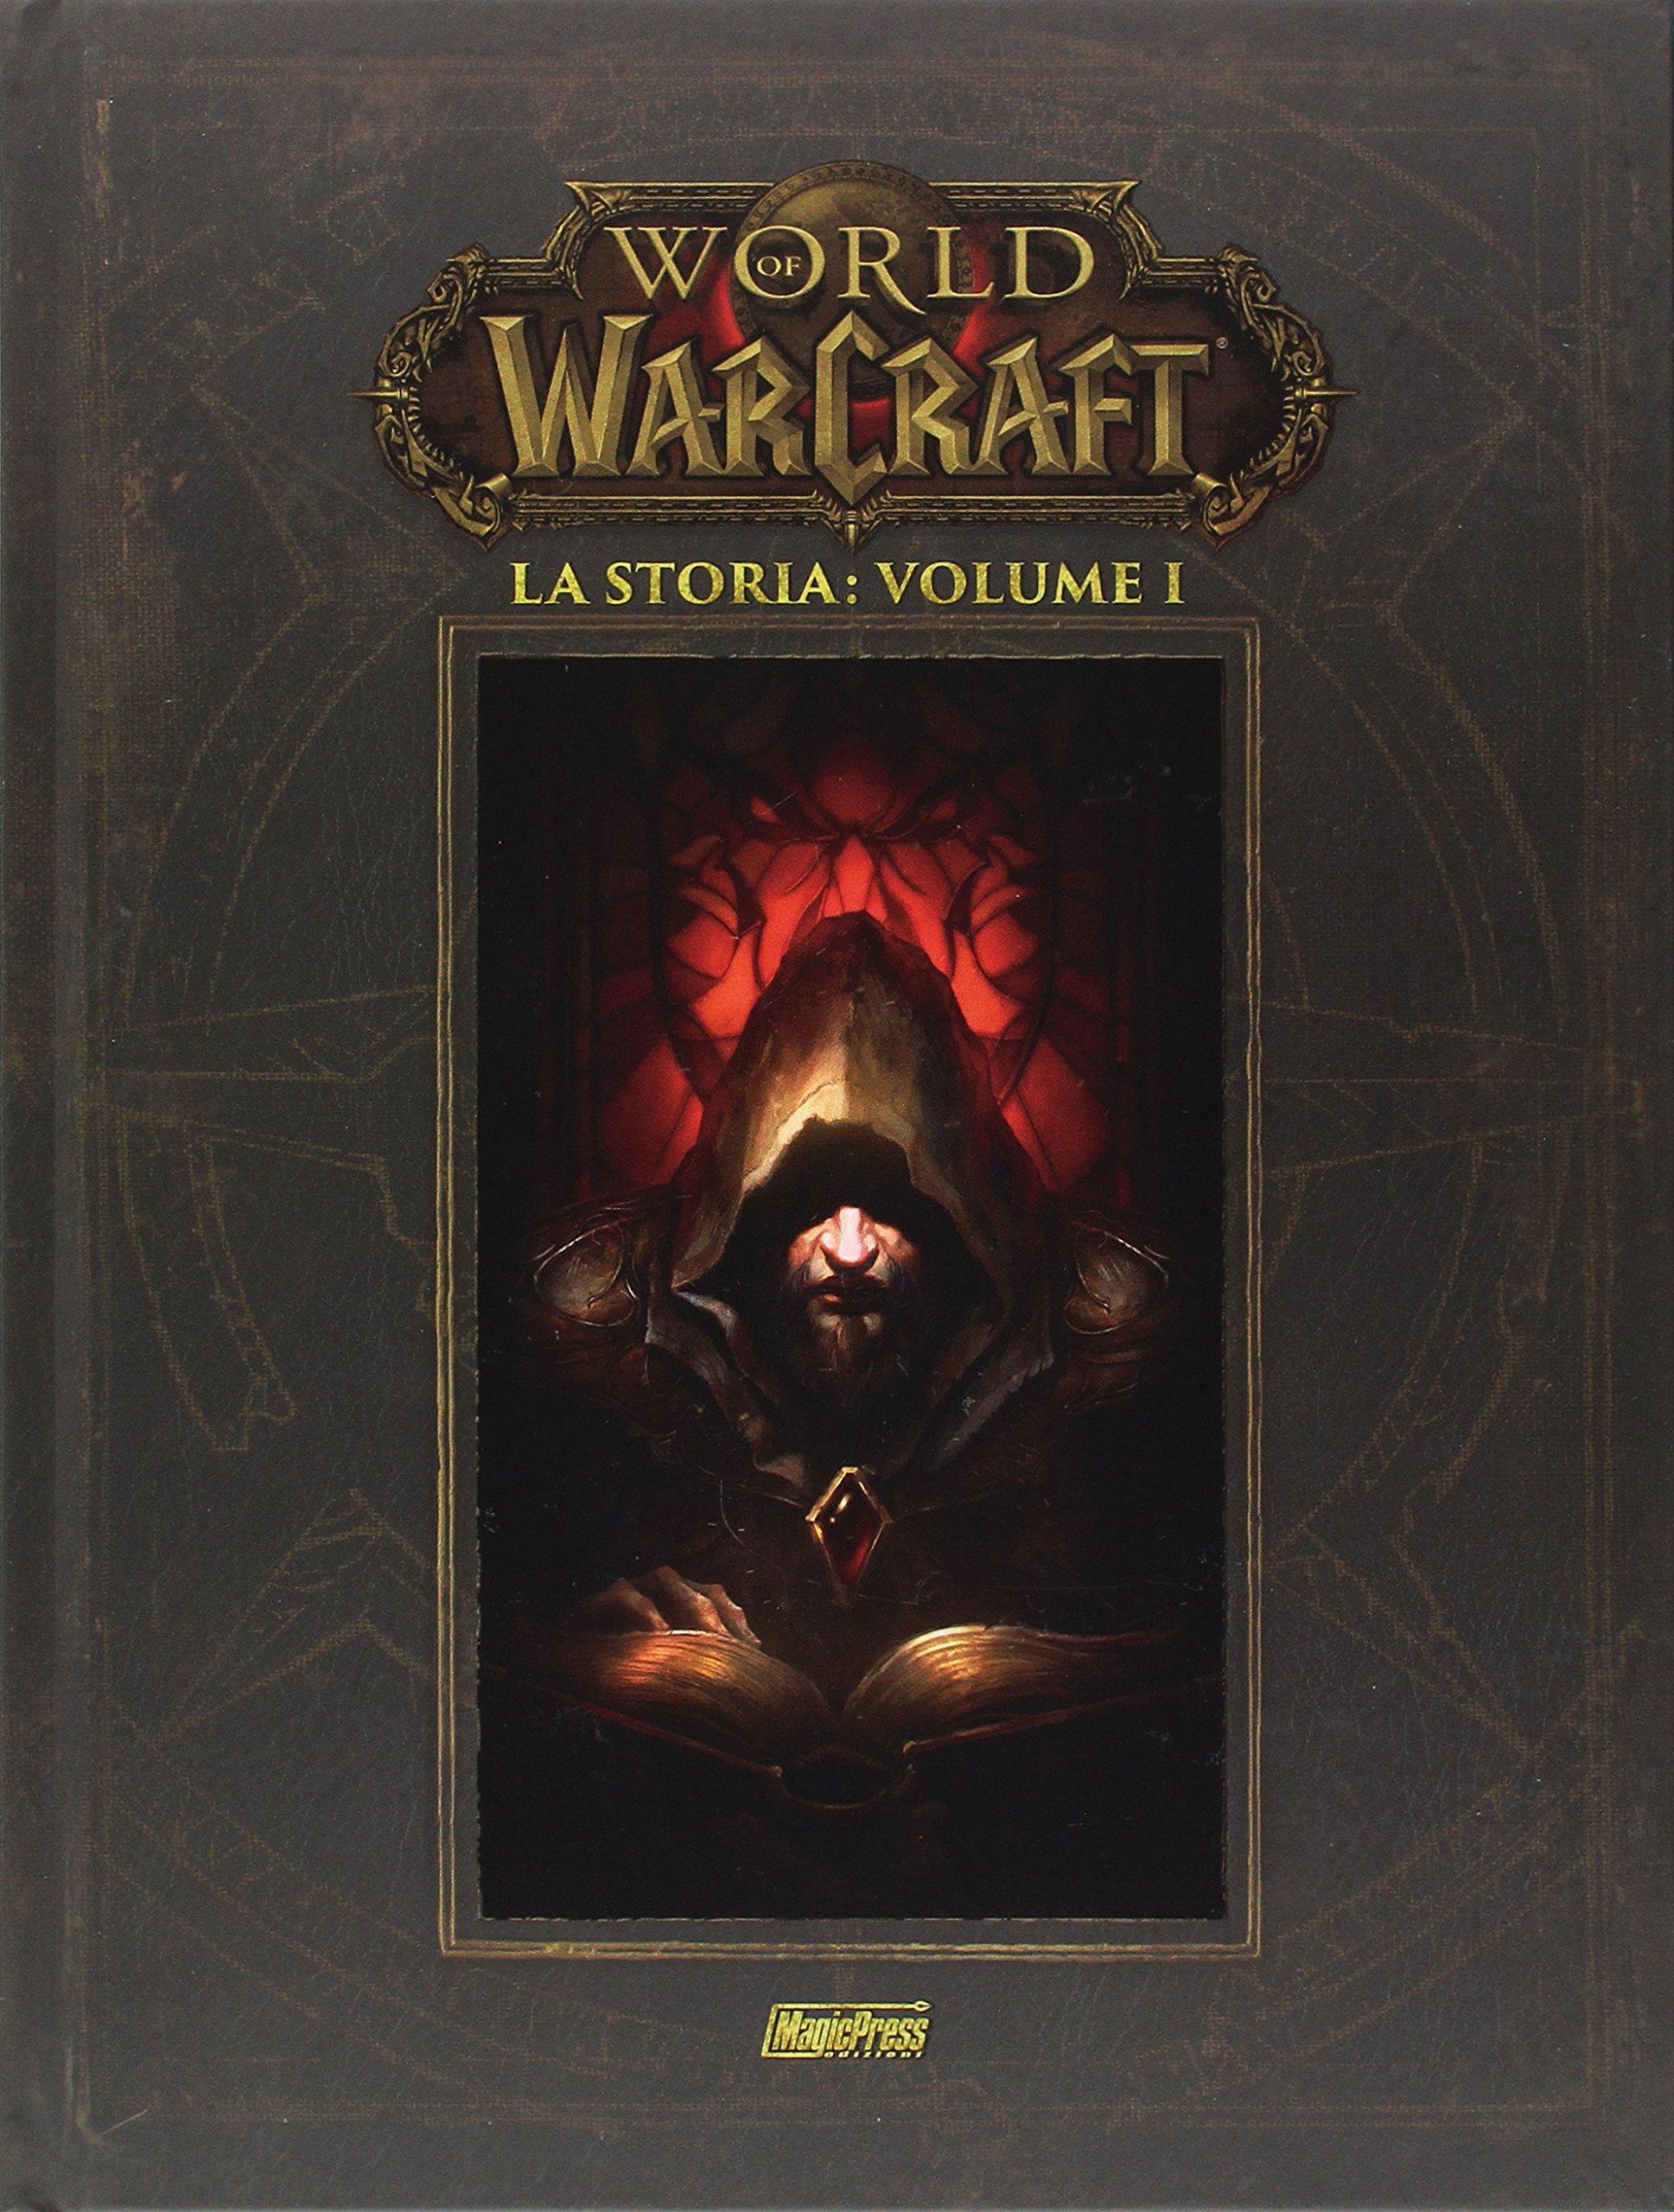 World of Warcraft: La storia Vol. 1